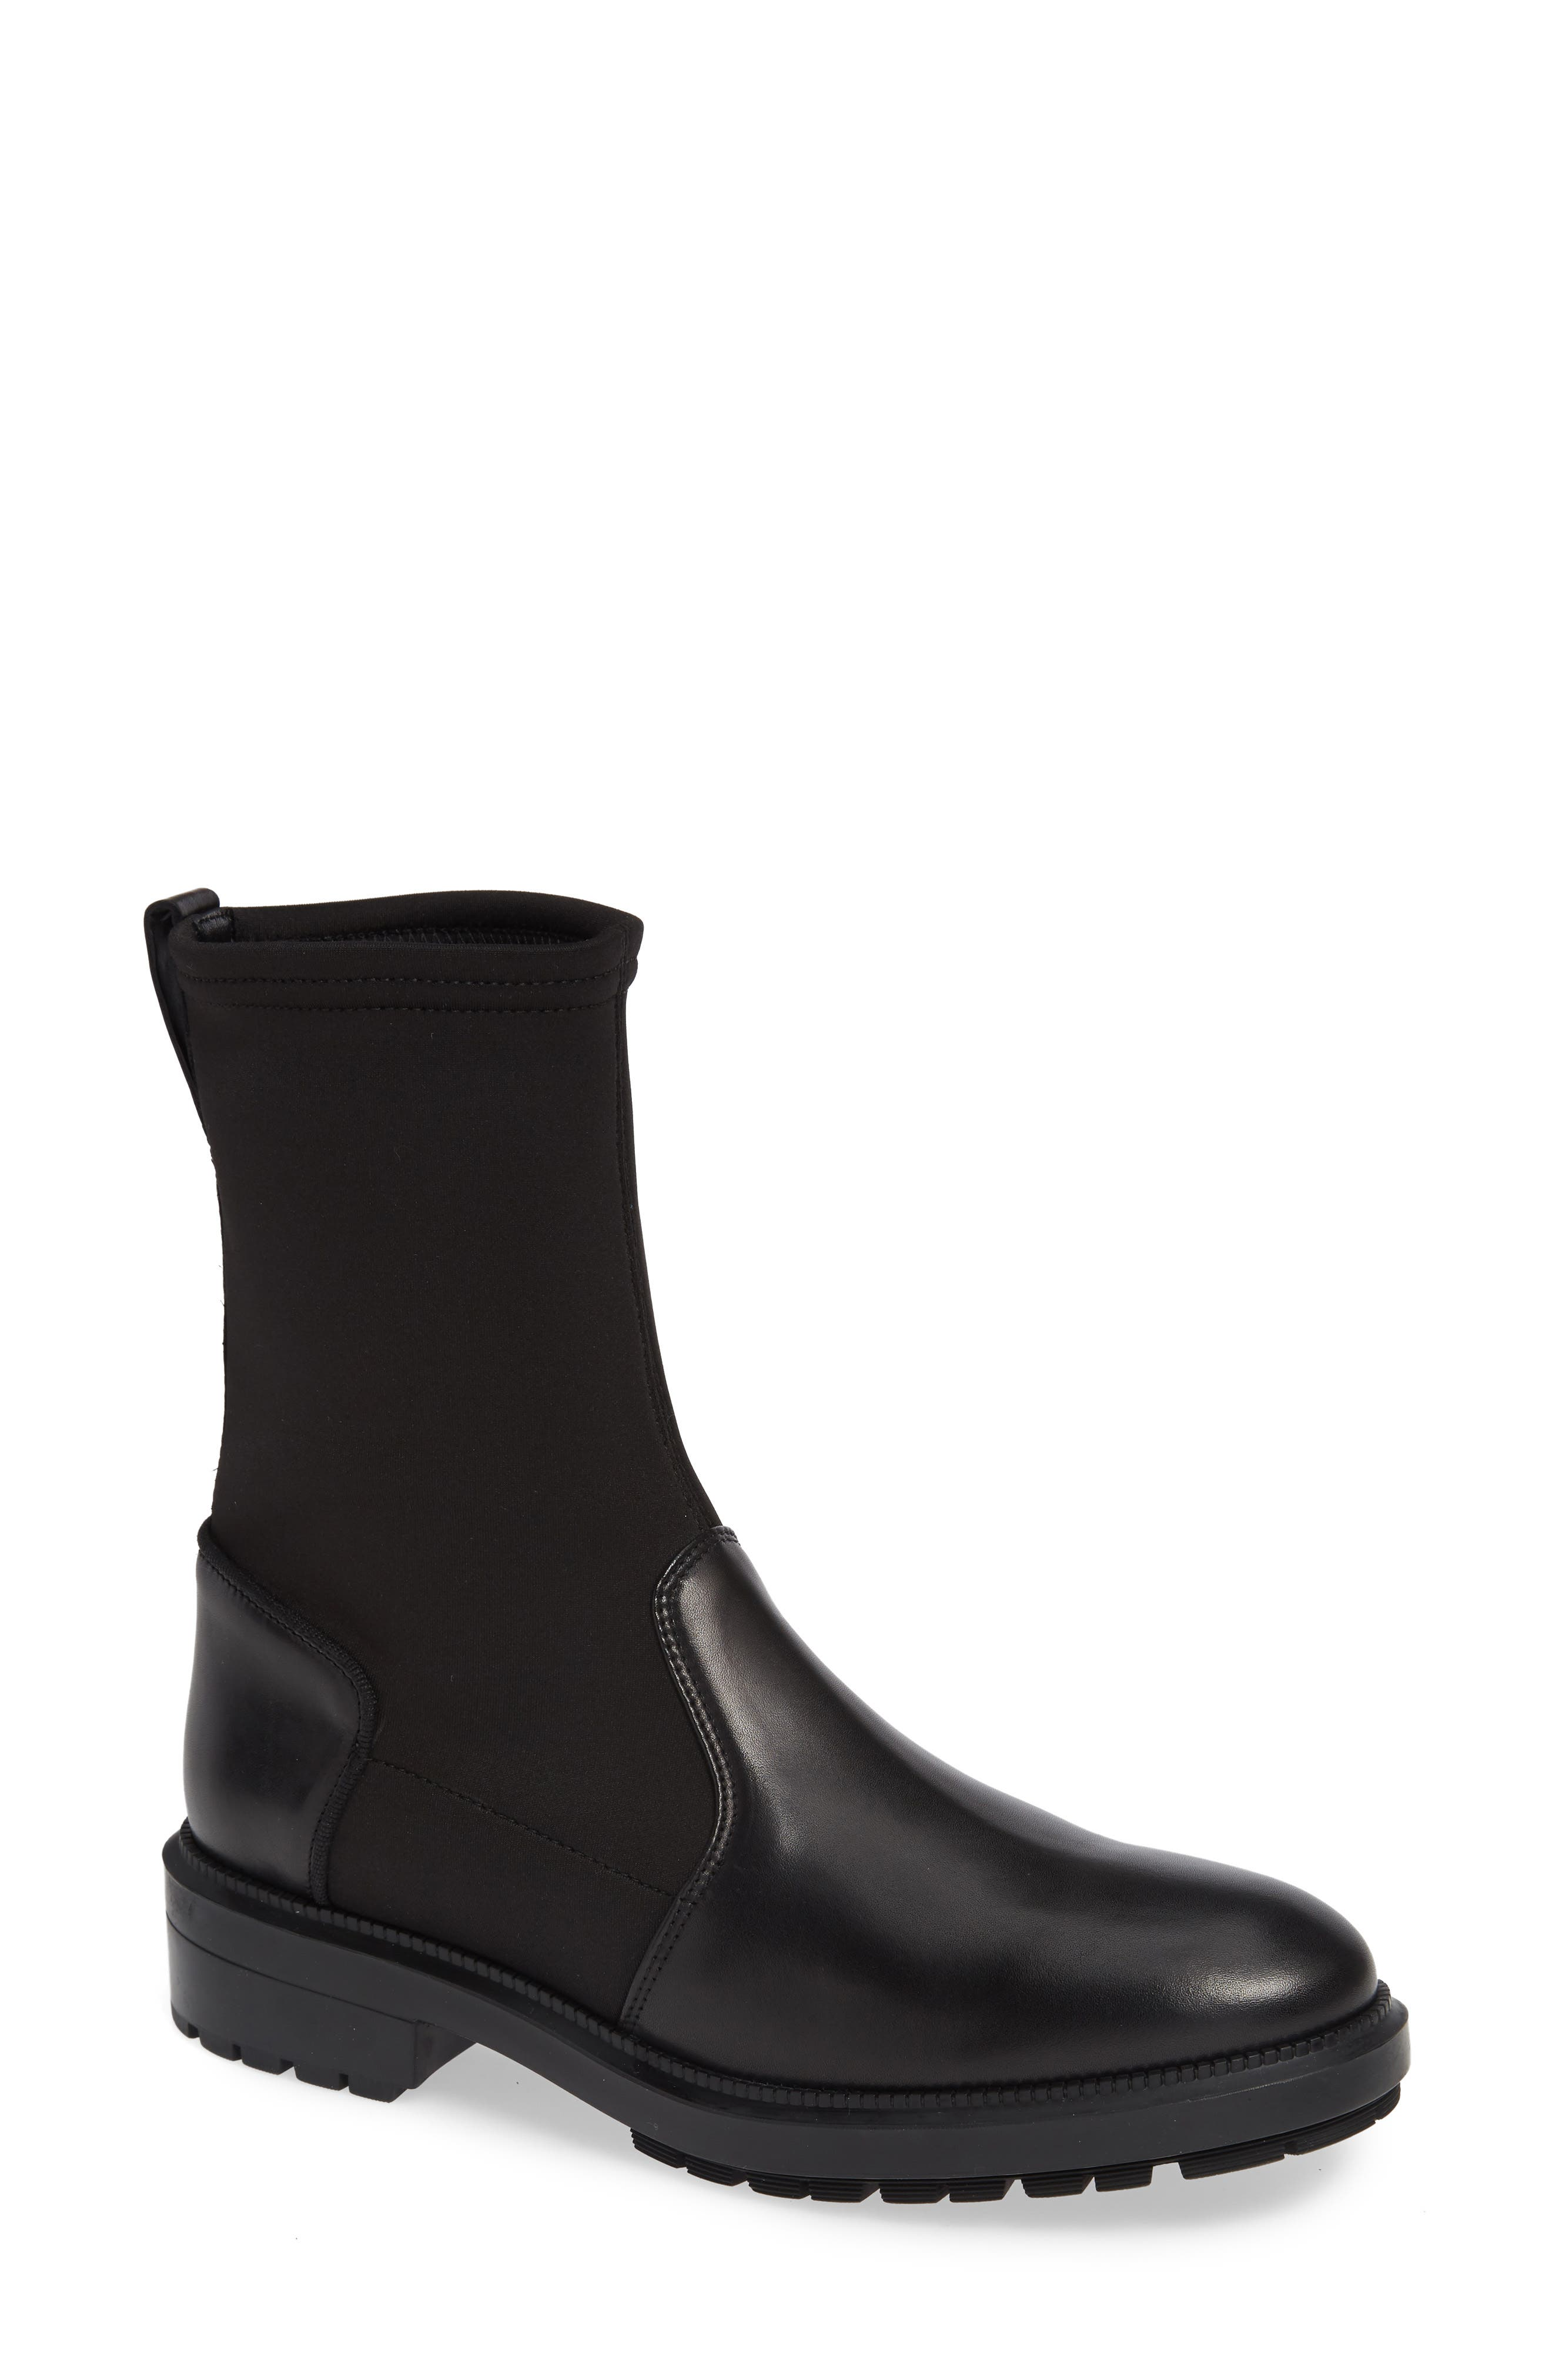 Leoda Ankle Boot,                             Main thumbnail 1, color,                             BLACK